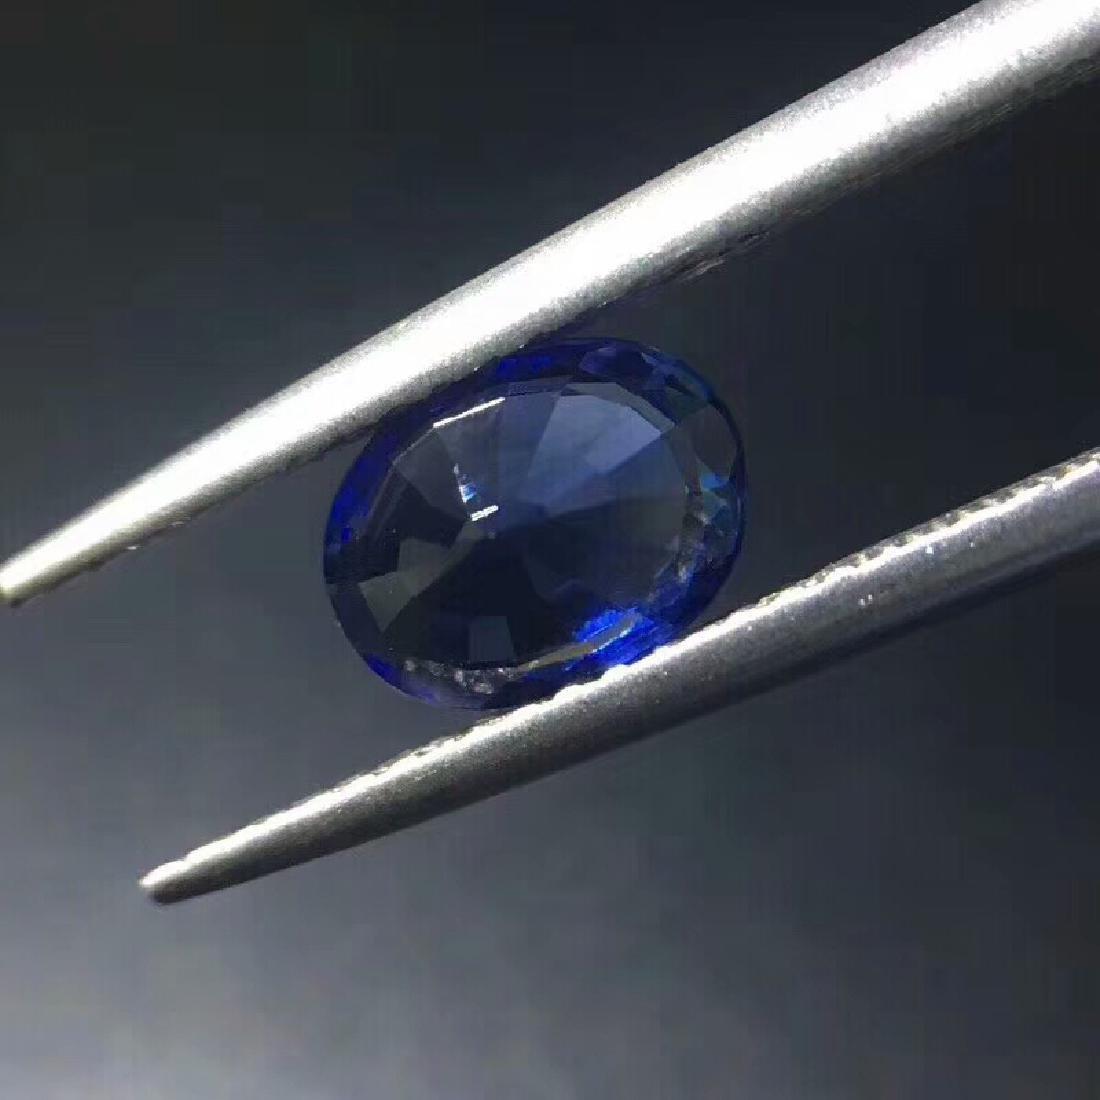 1.3 ct Sapphire 7.2*5.9*3.7 mm Oval Cut - 5